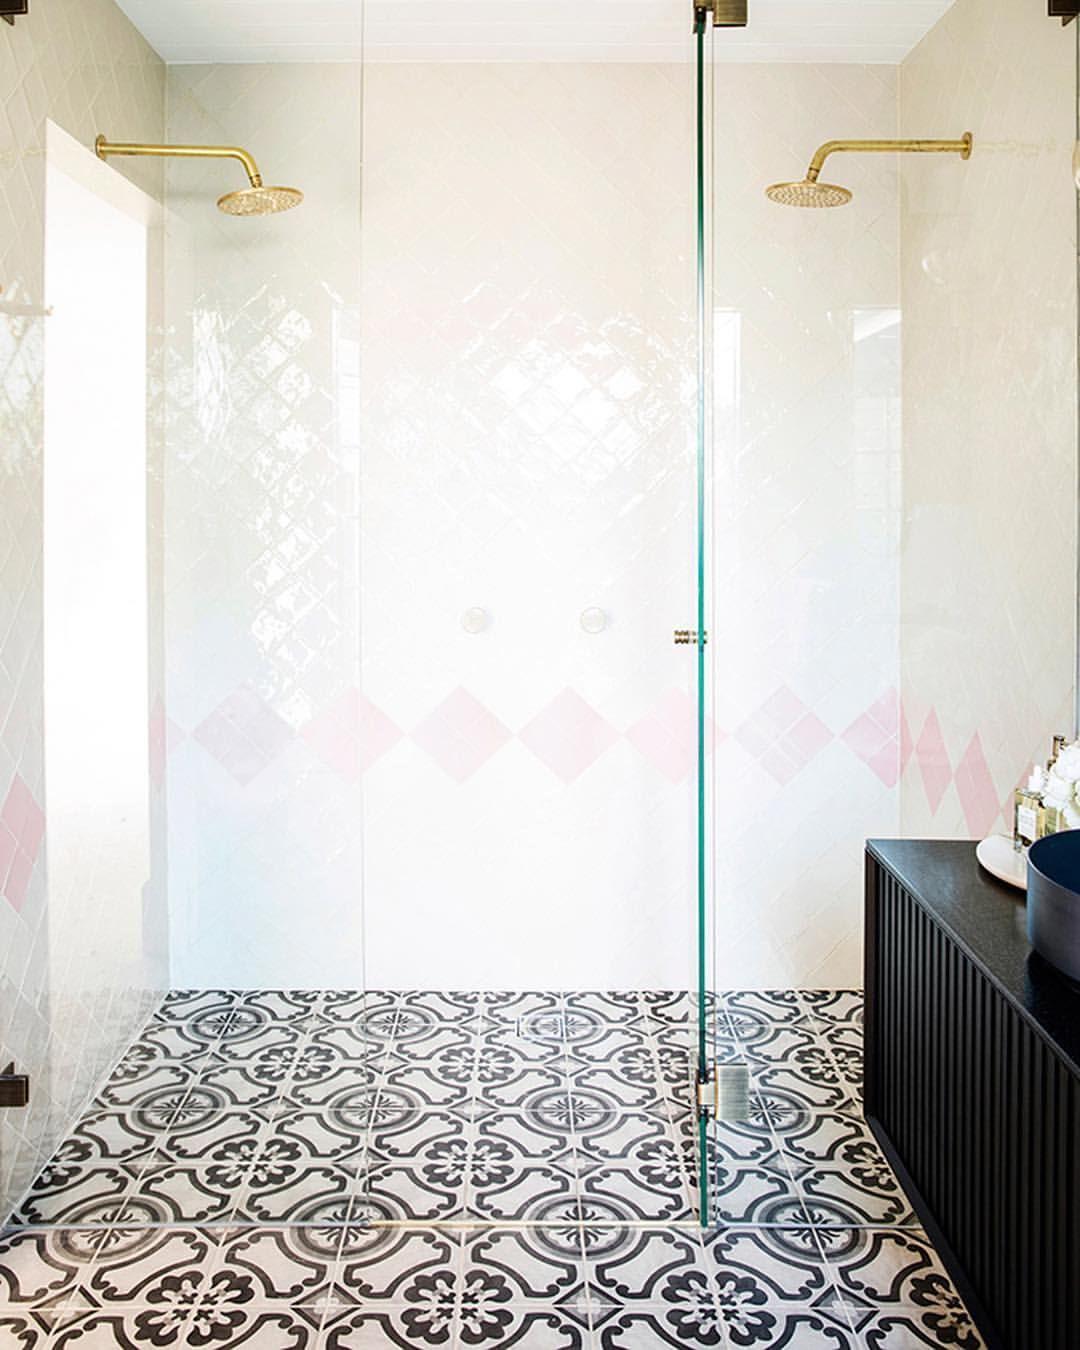 Amber Tiles Kellyville Pinned From Instagram Threebirdsrenovations 100x100 Handmade Tiles In White Decor Interior Design Three Birds Renovations Home Decor